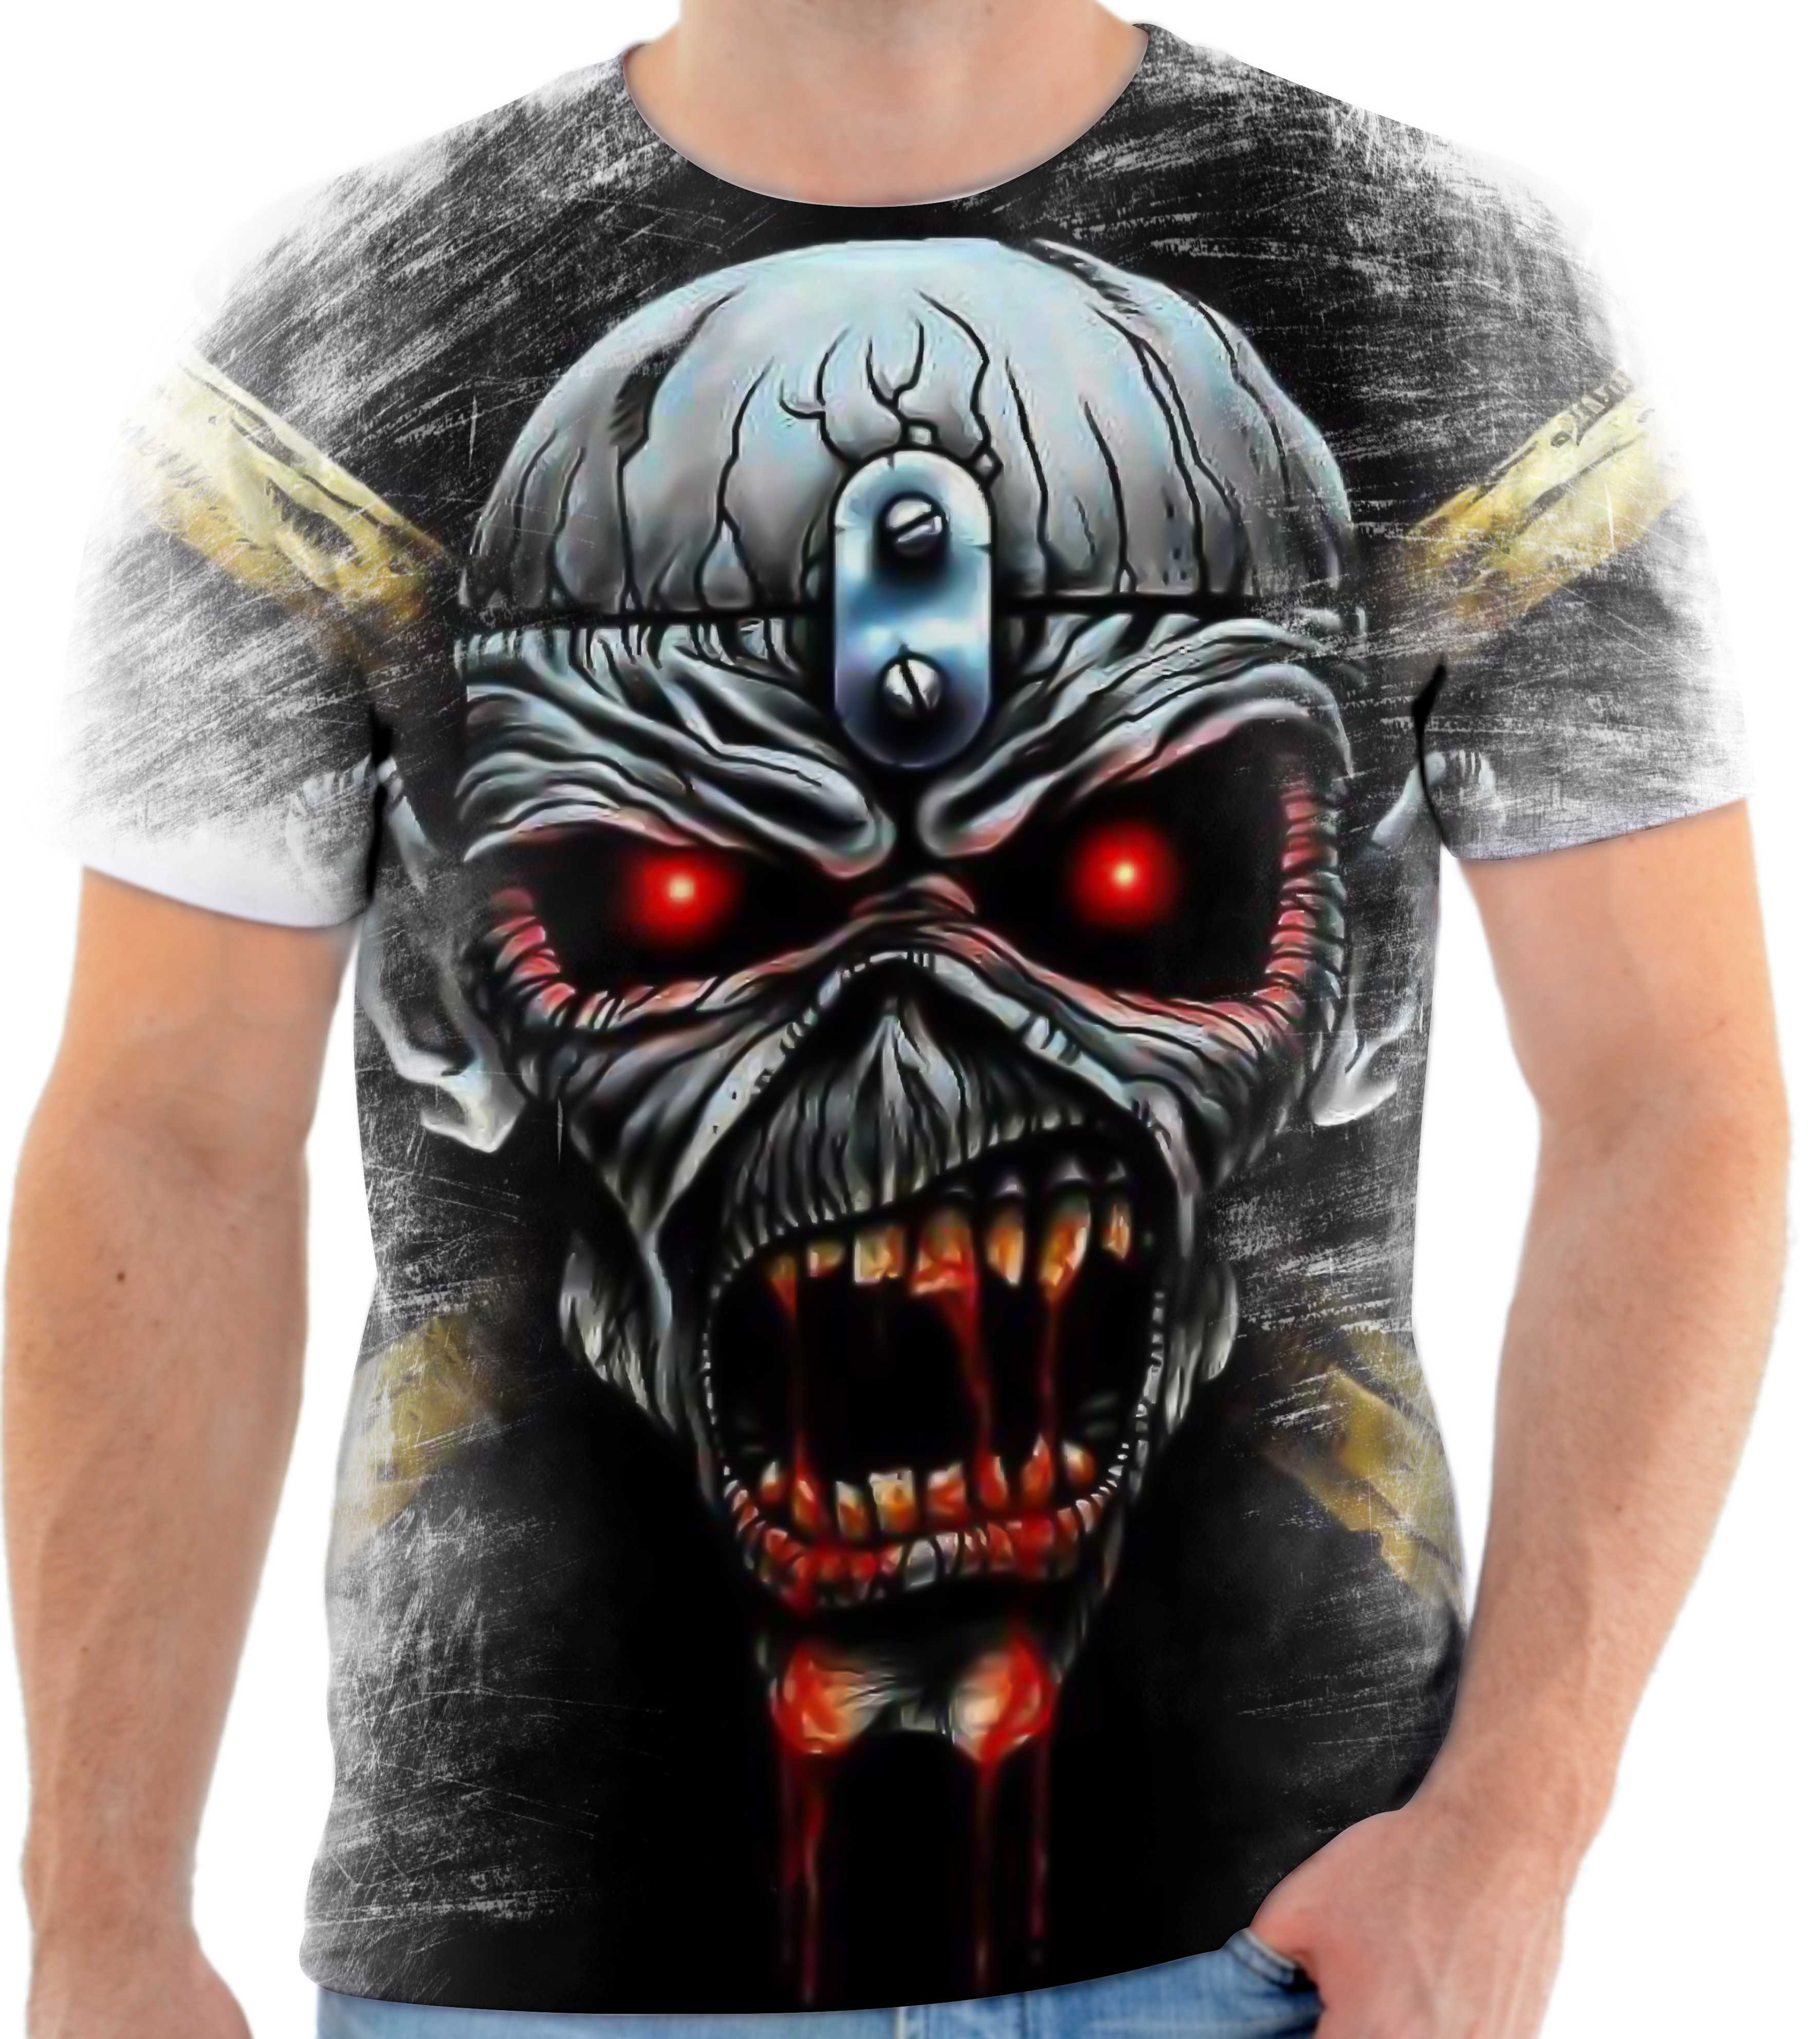 fe38860d8 Camisa Camiseta Personalizada Iron Maiden Banda Metal 6